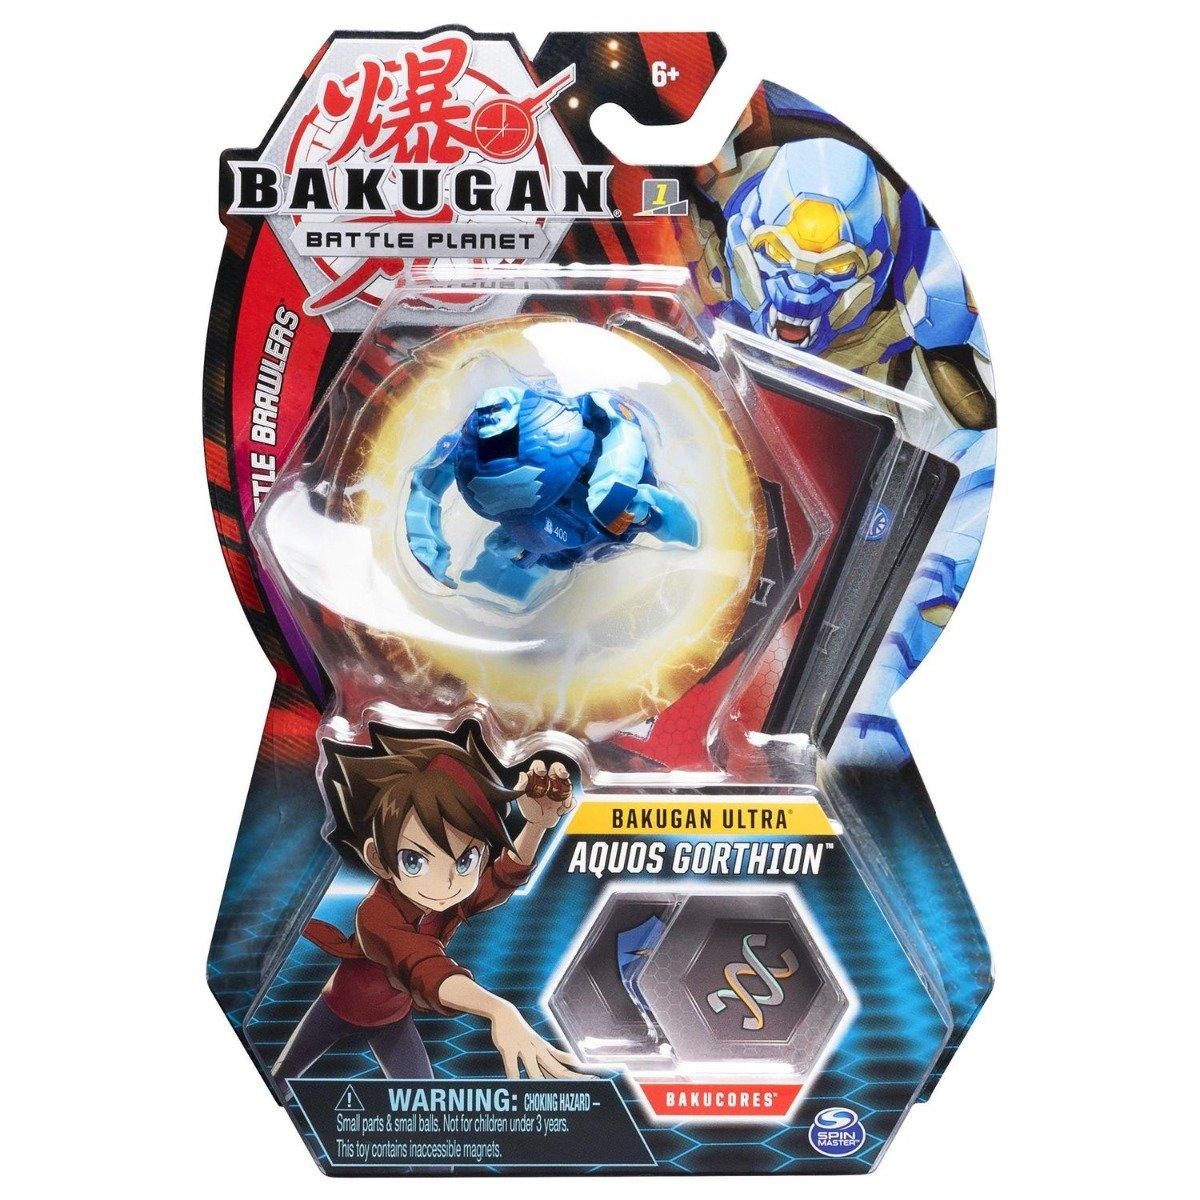 Figurina Bakugan Ultra Battle Planet, 15B Gorilla Blue, 20109038